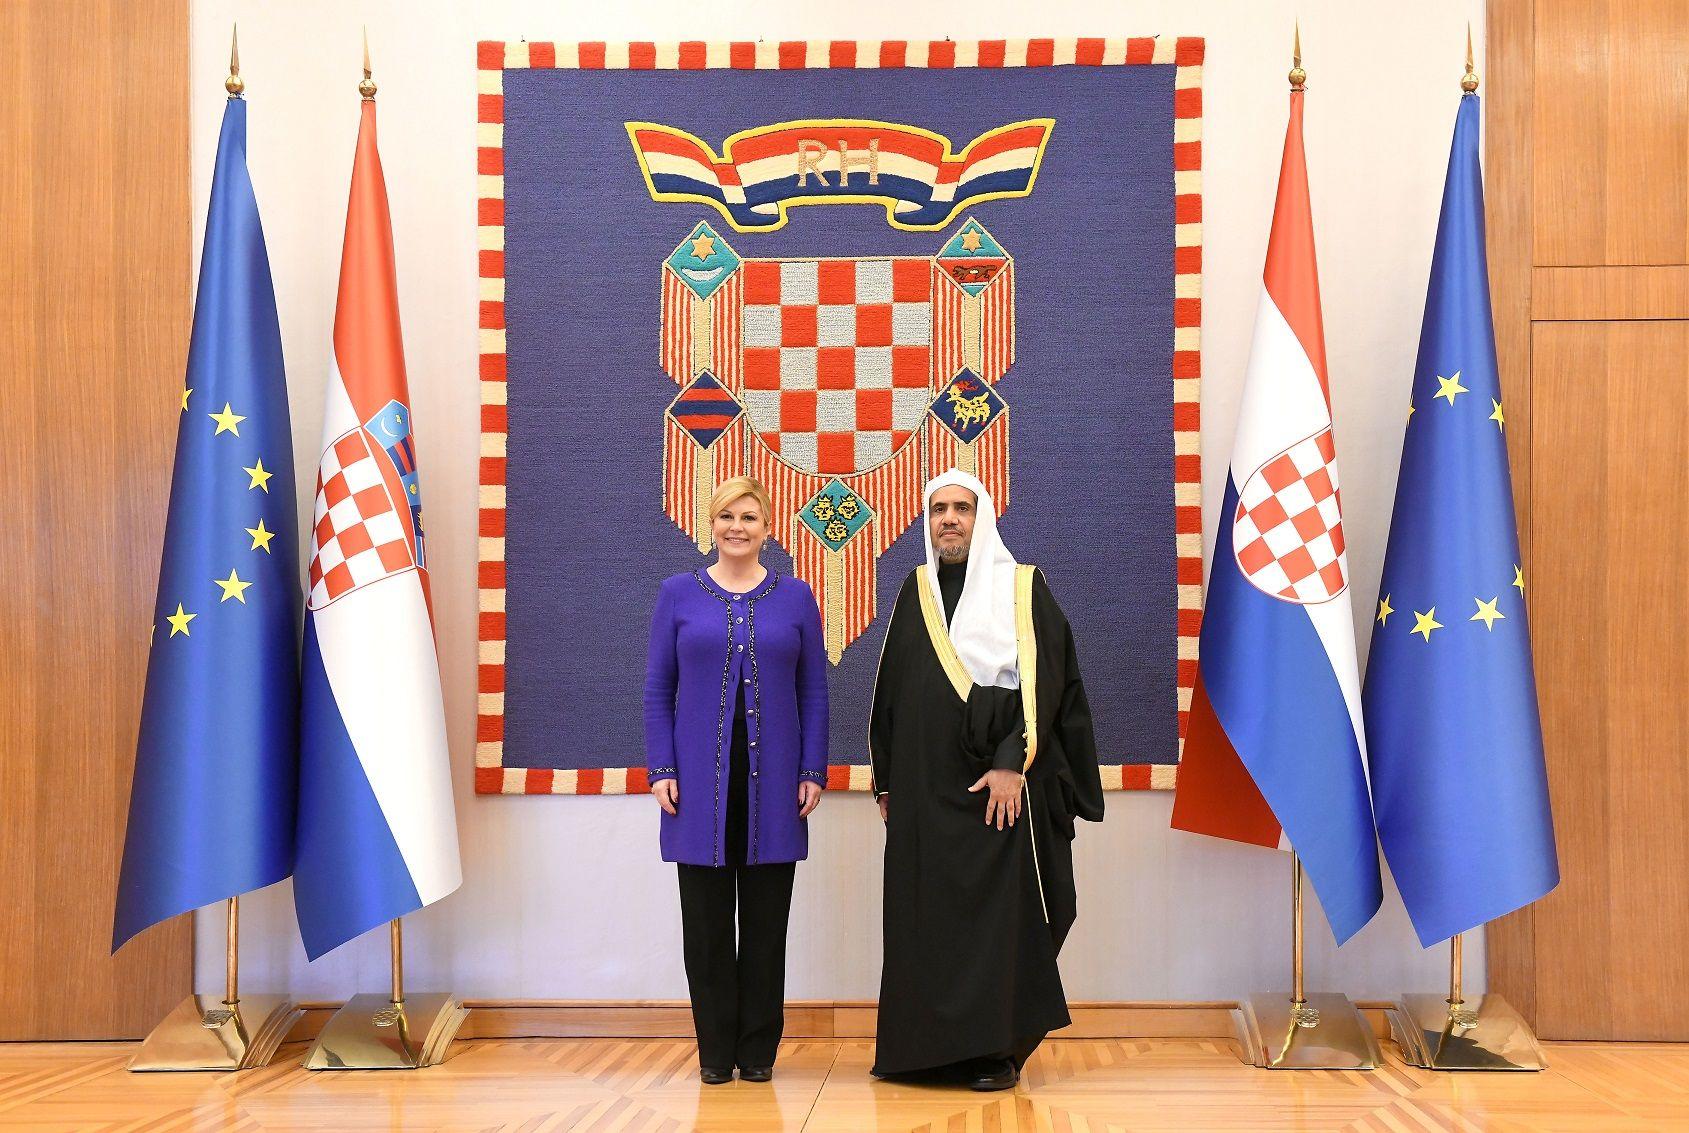 Muslimanski čelnik kaže da je Hrvatska zemlja mira, sklada i vjerskih sloboda